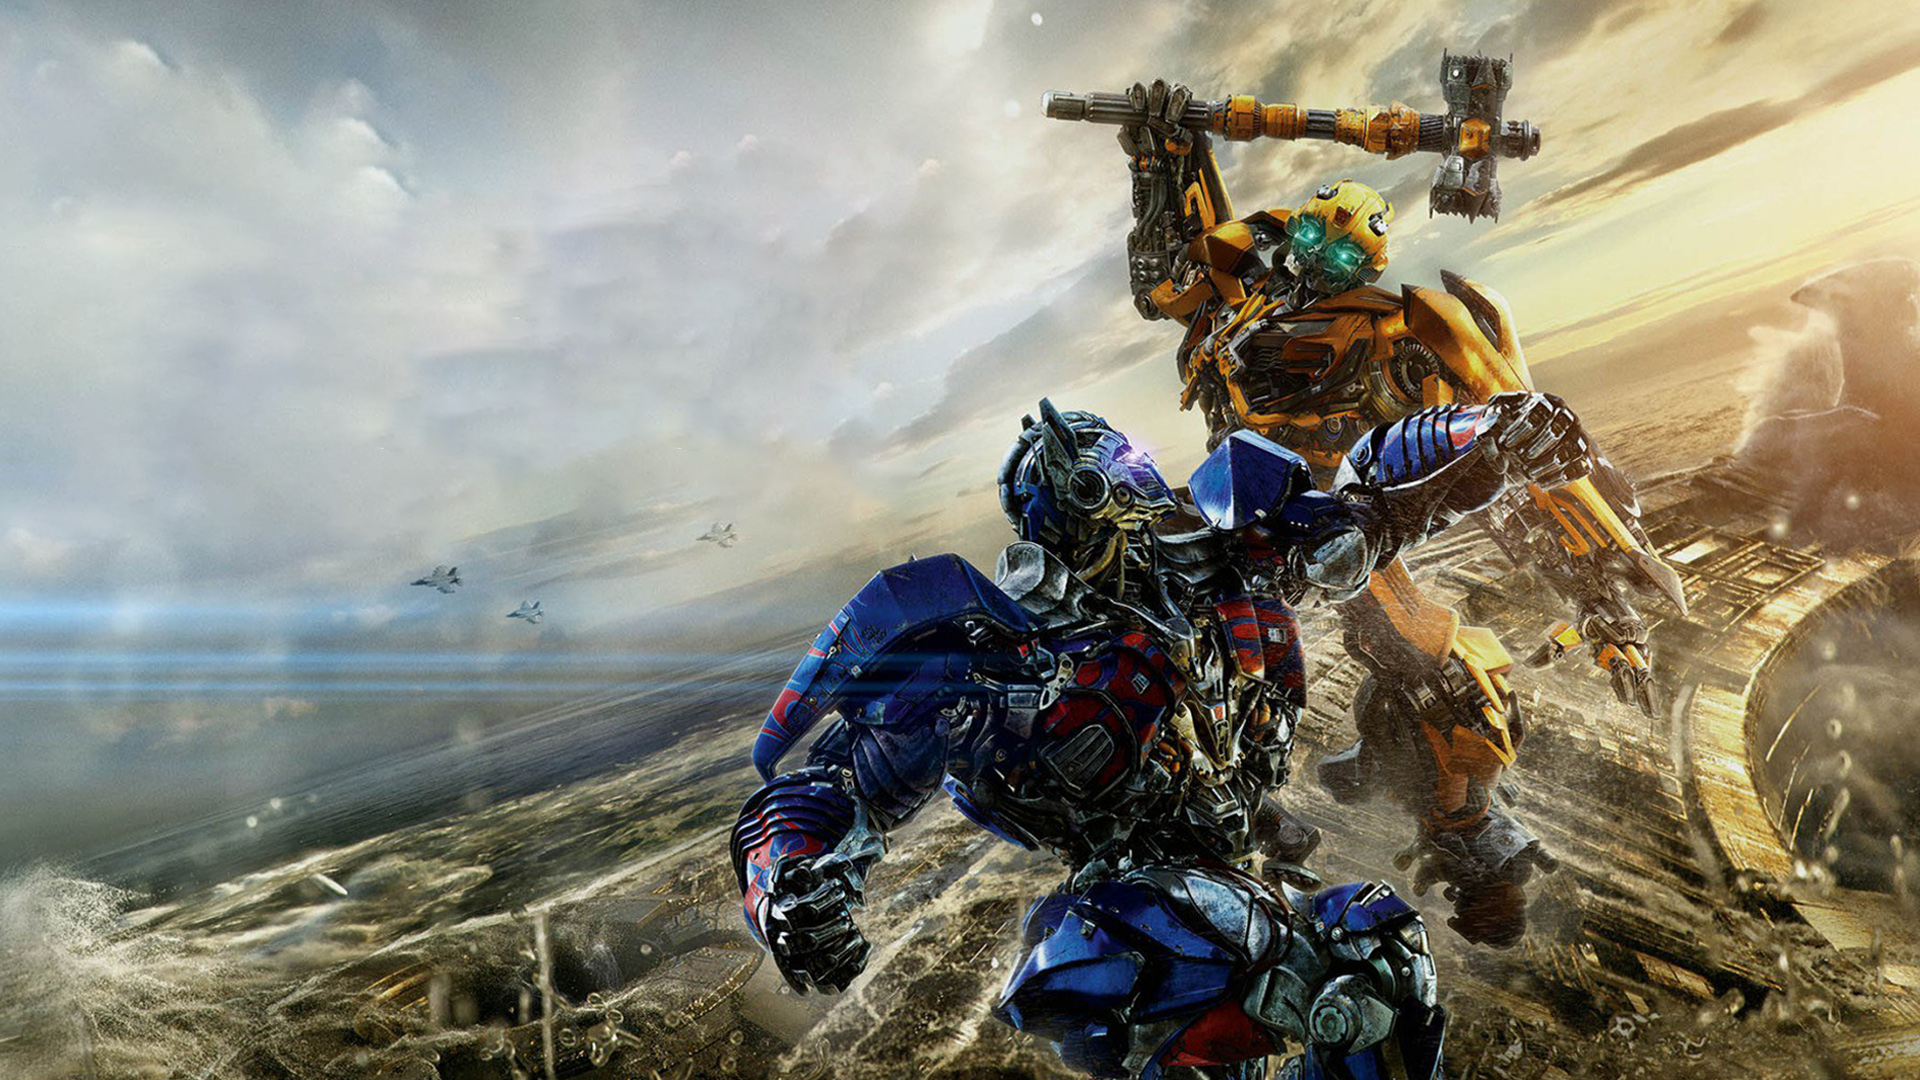 Transformers The Last Knight Wallpaper By Dark Mamba 995